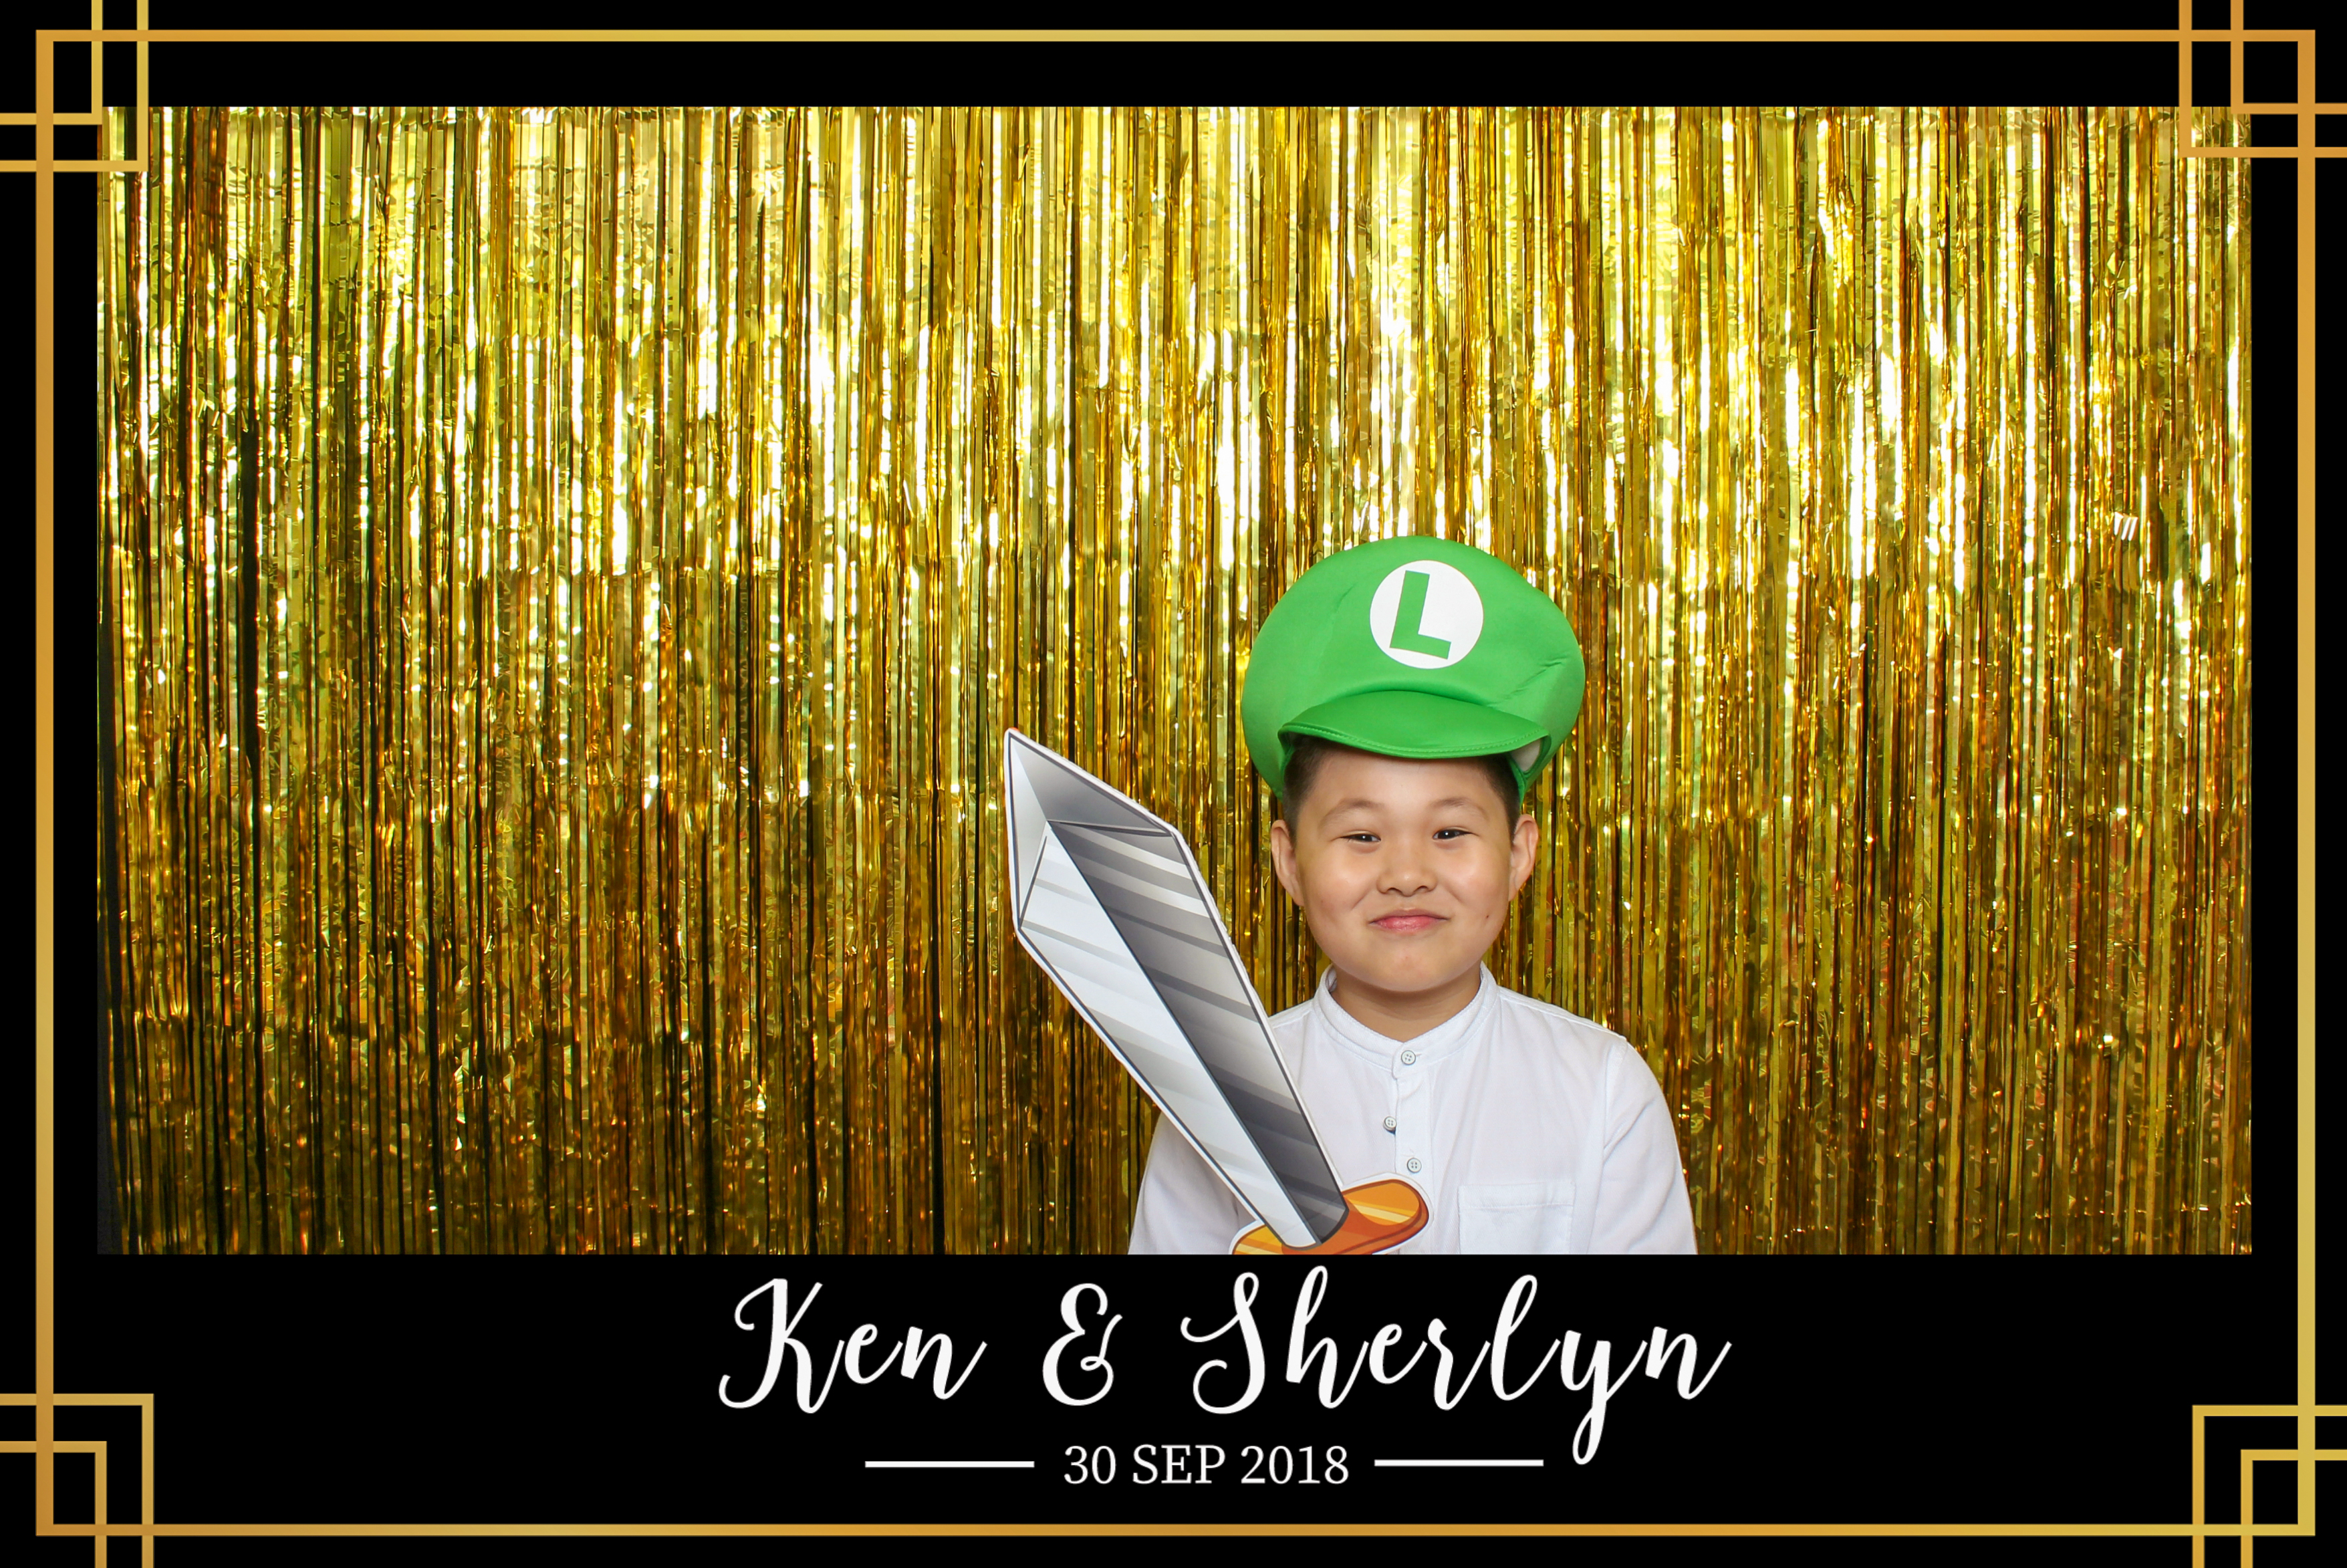 Ken Sherlyn wedding photo booth (36)